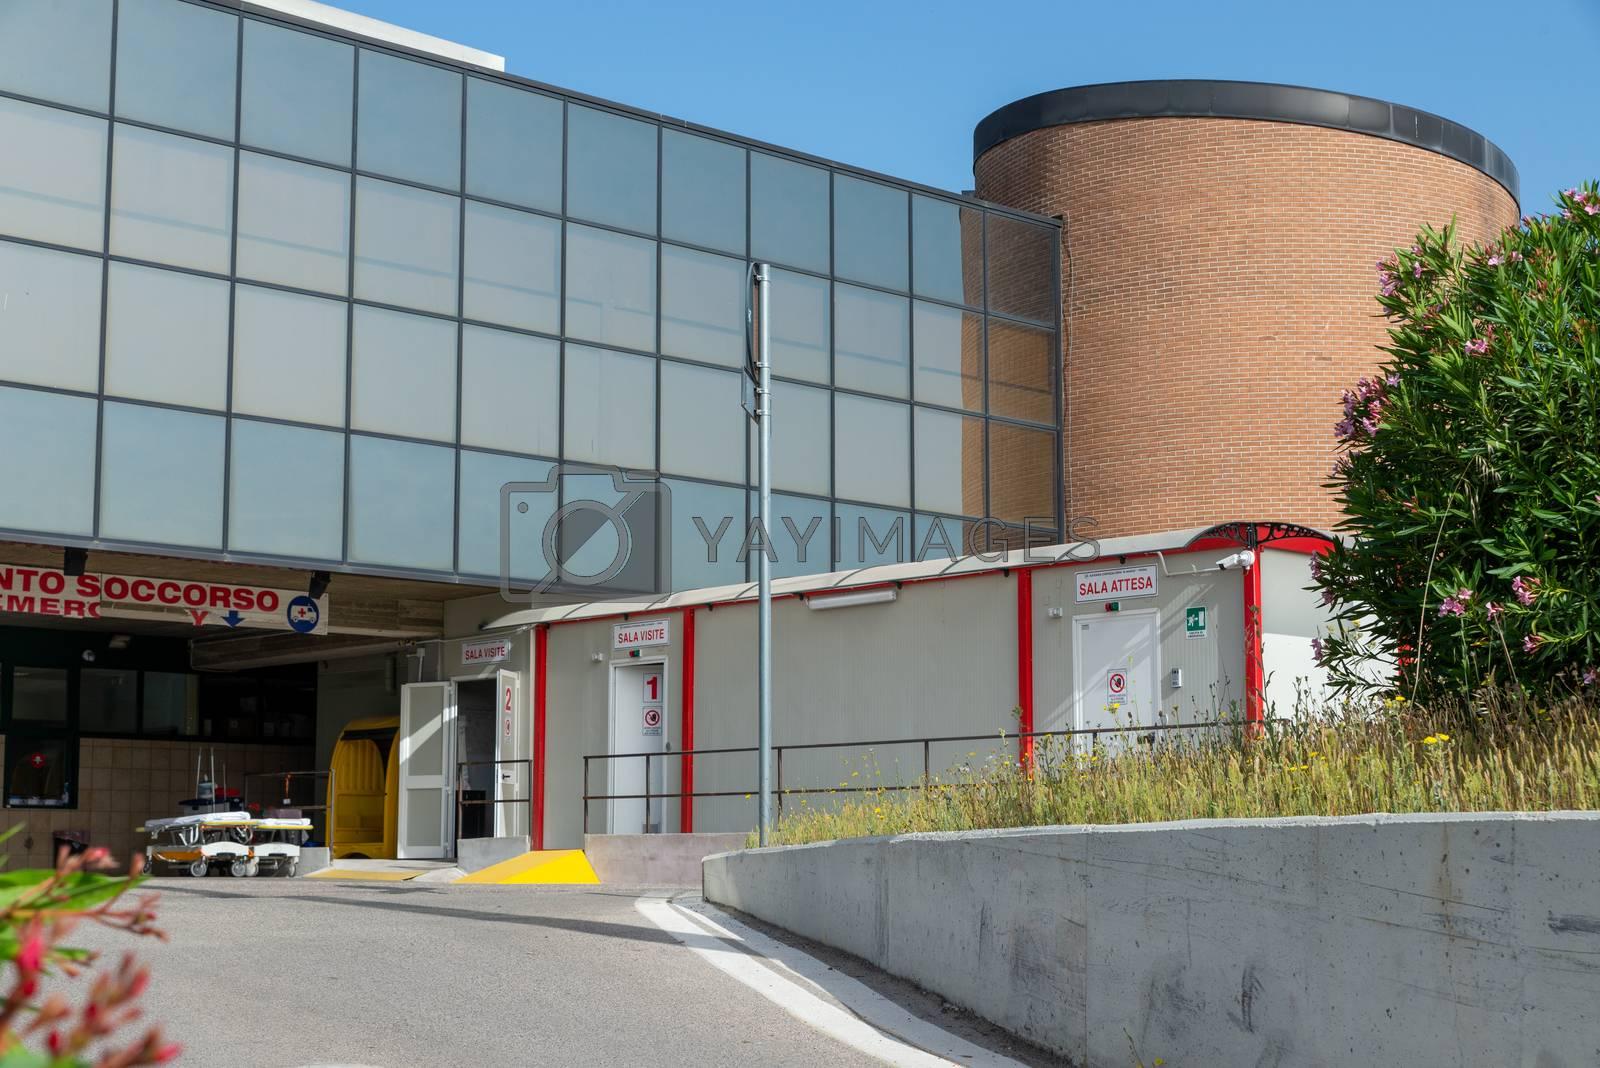 terni,italy may 17 2020 :emergency room of the santa maria di terni hospital set up for covid emergency 19